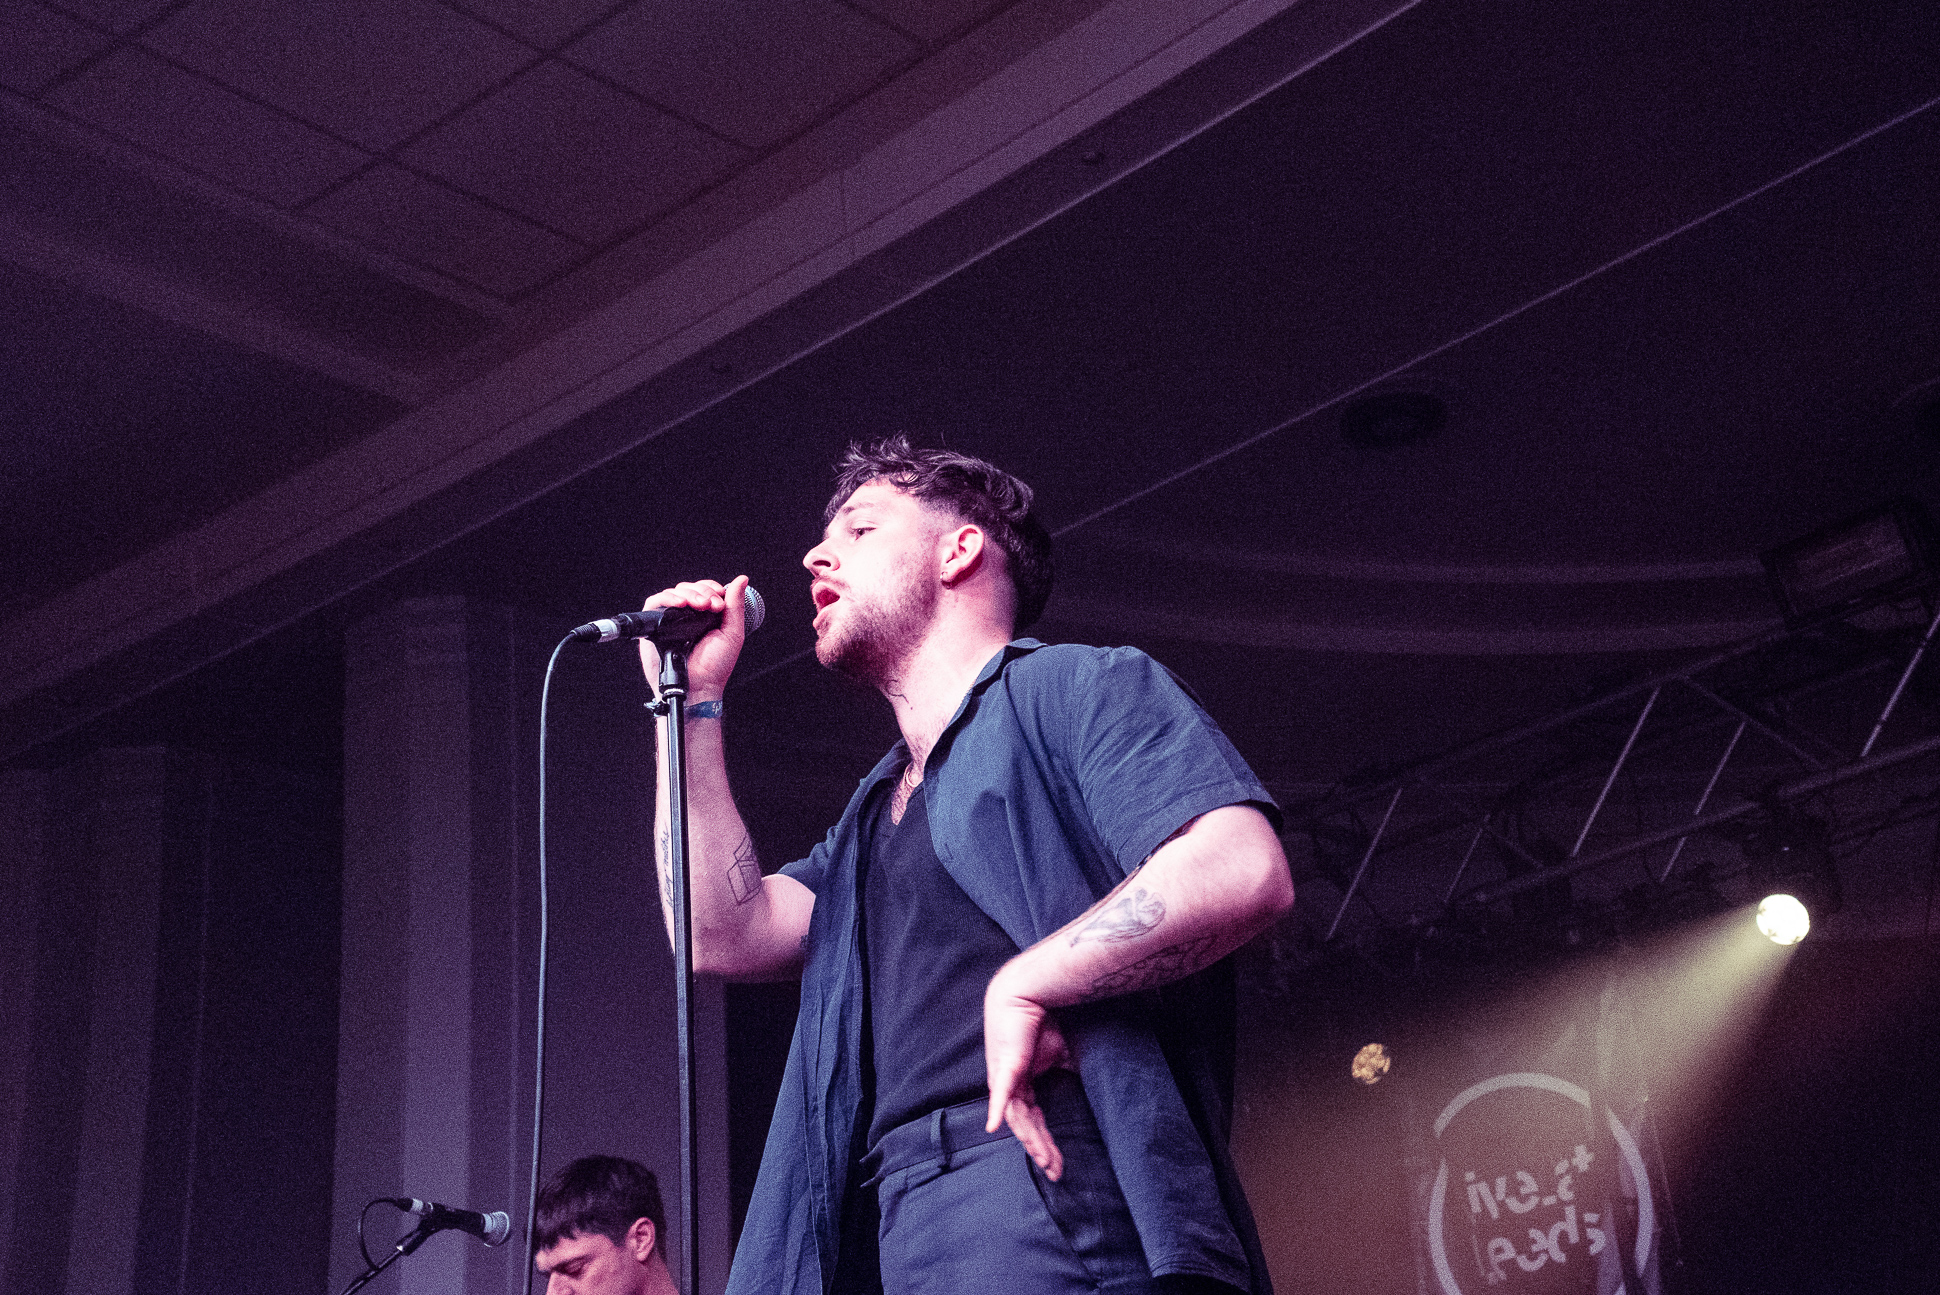 Live At Leeds 2019 - Tom Grennan_-12.jpg